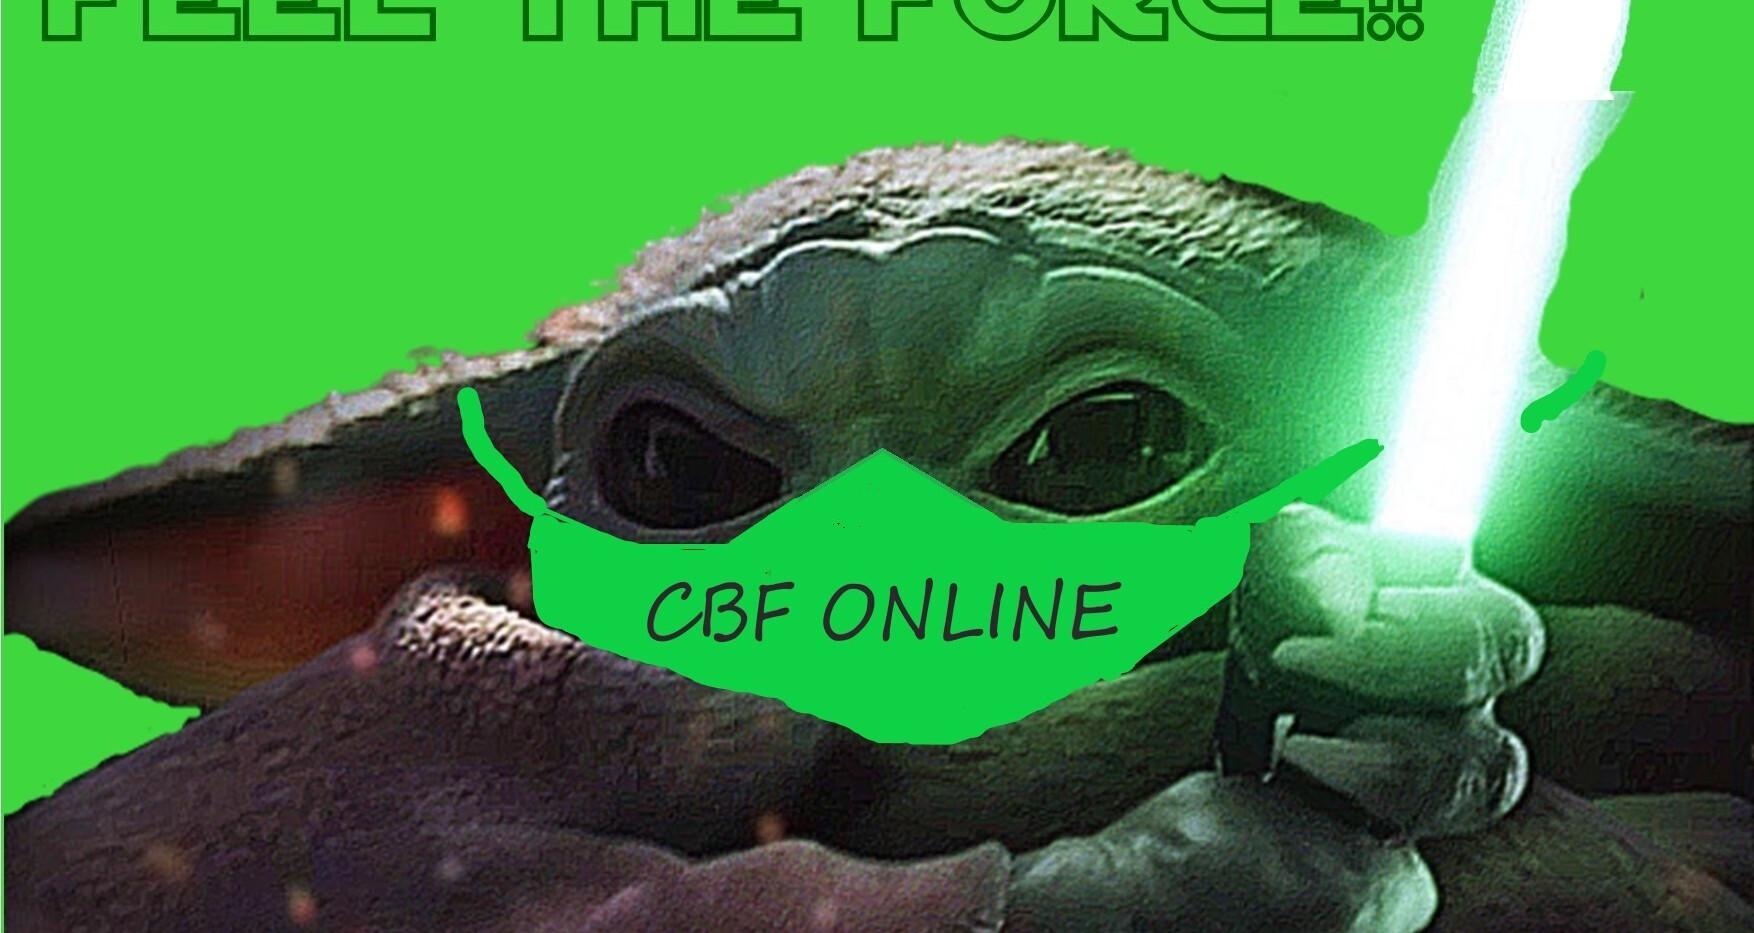 The Green Baby Yoda's Logo